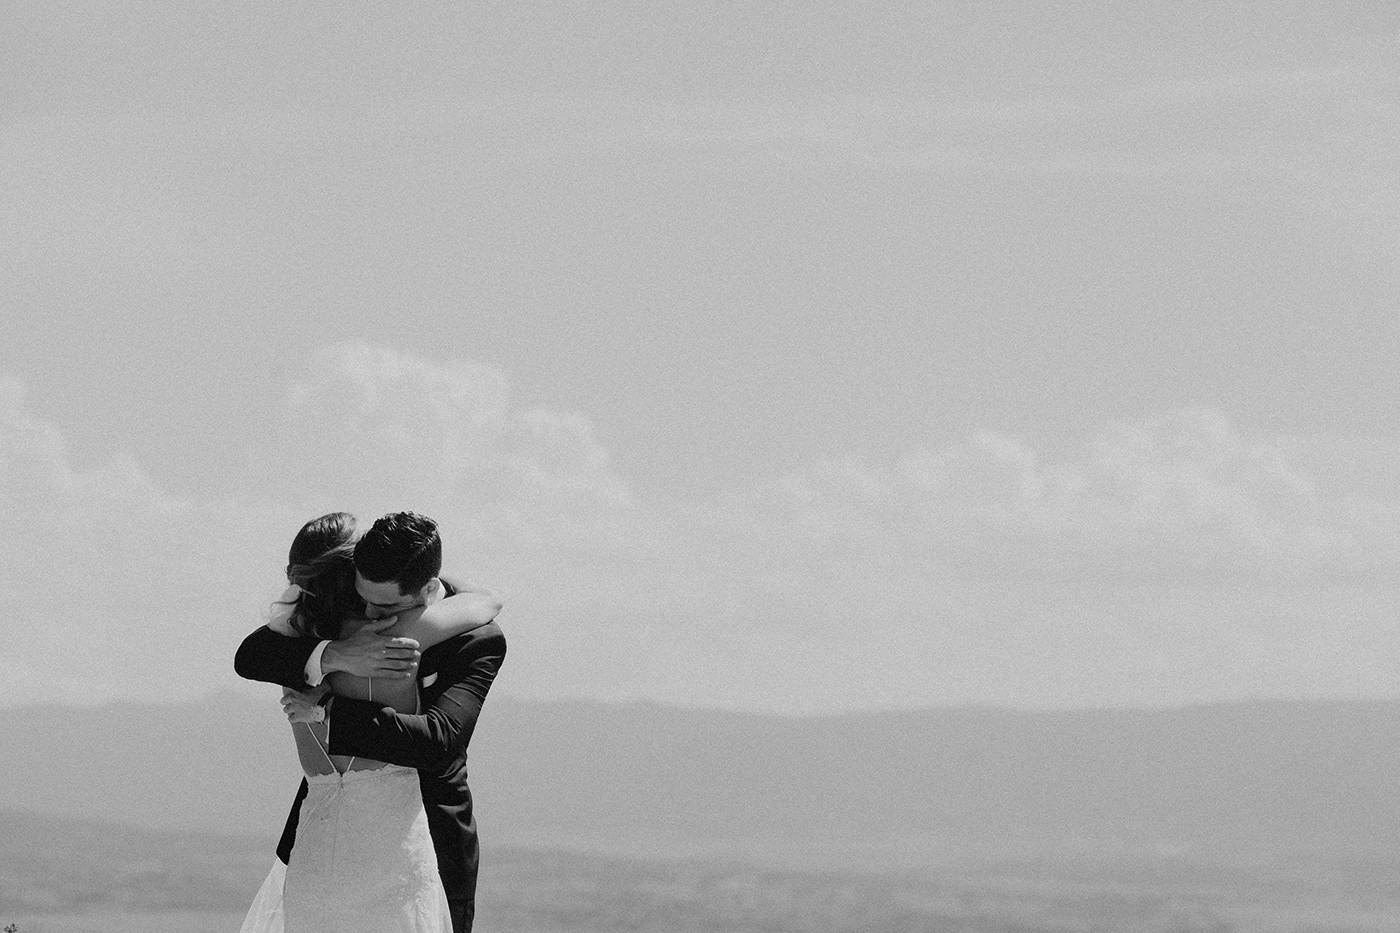 denver-colorado-wedding-first-look-hugging-bride-groom-bw.jpg